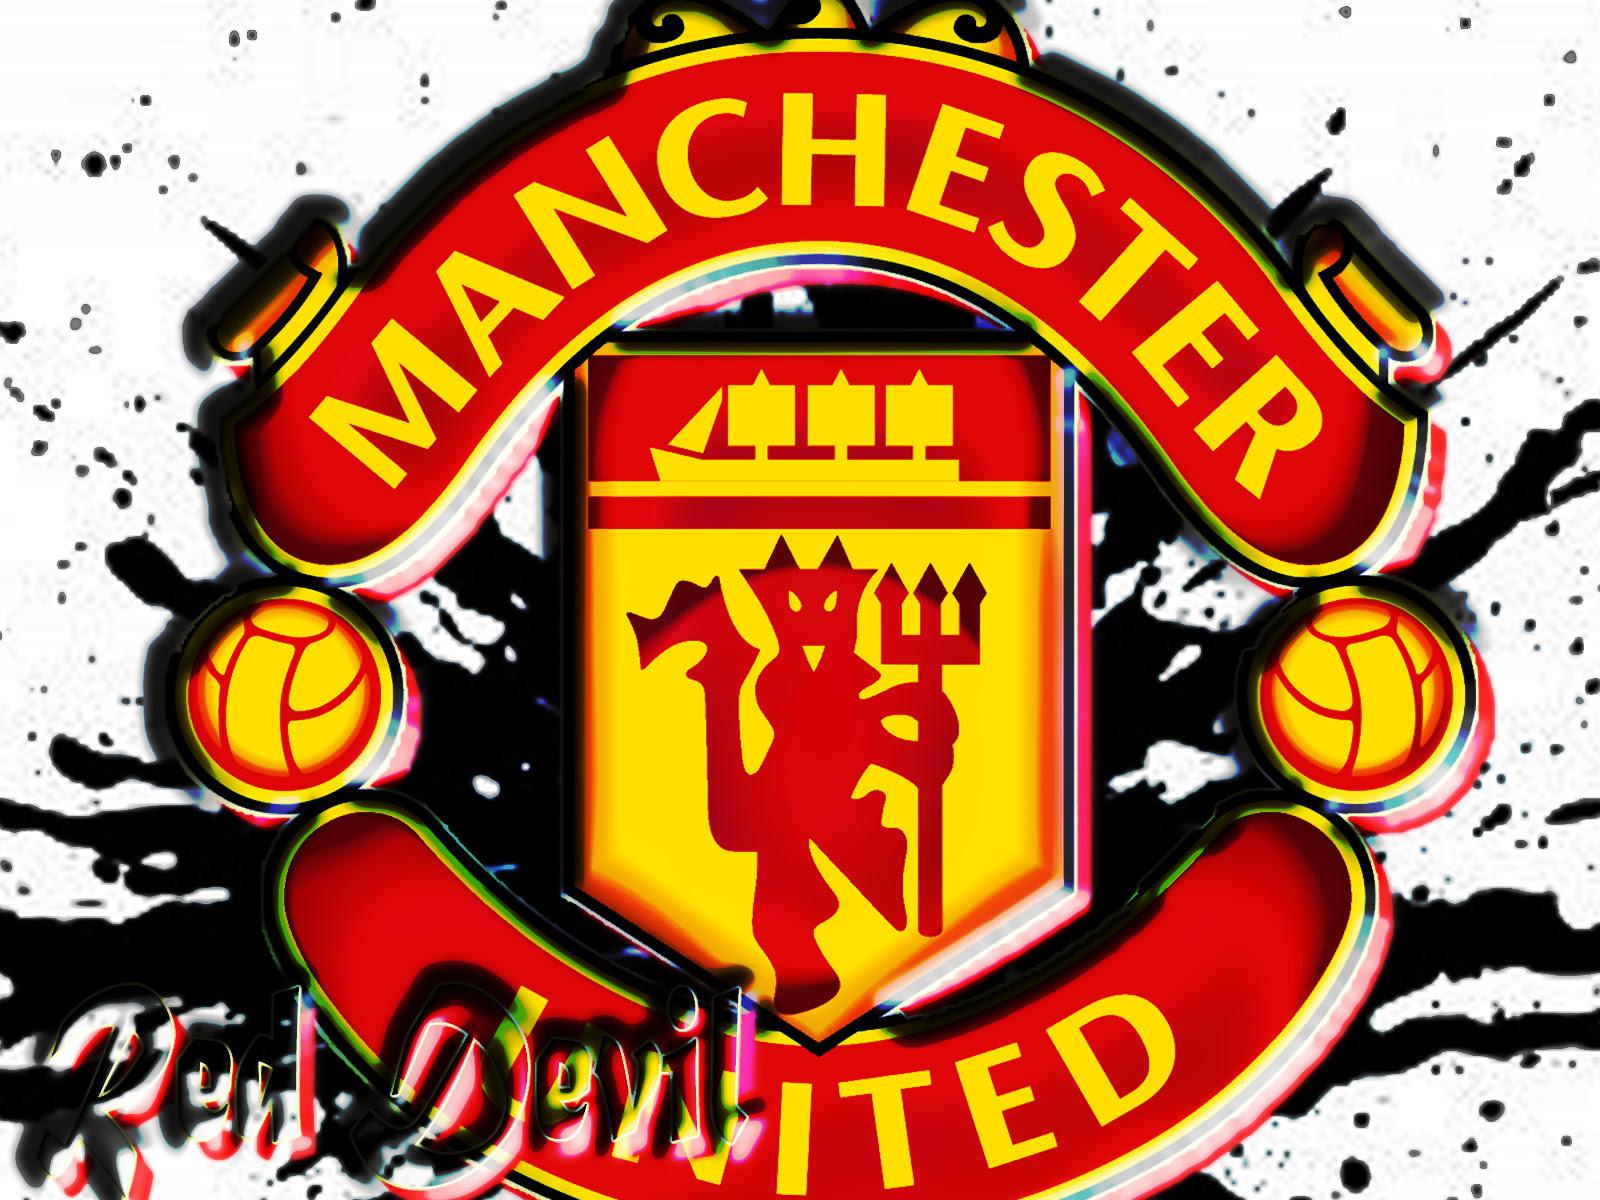 Kumpulan Wallpaper Manchester United Terkeren